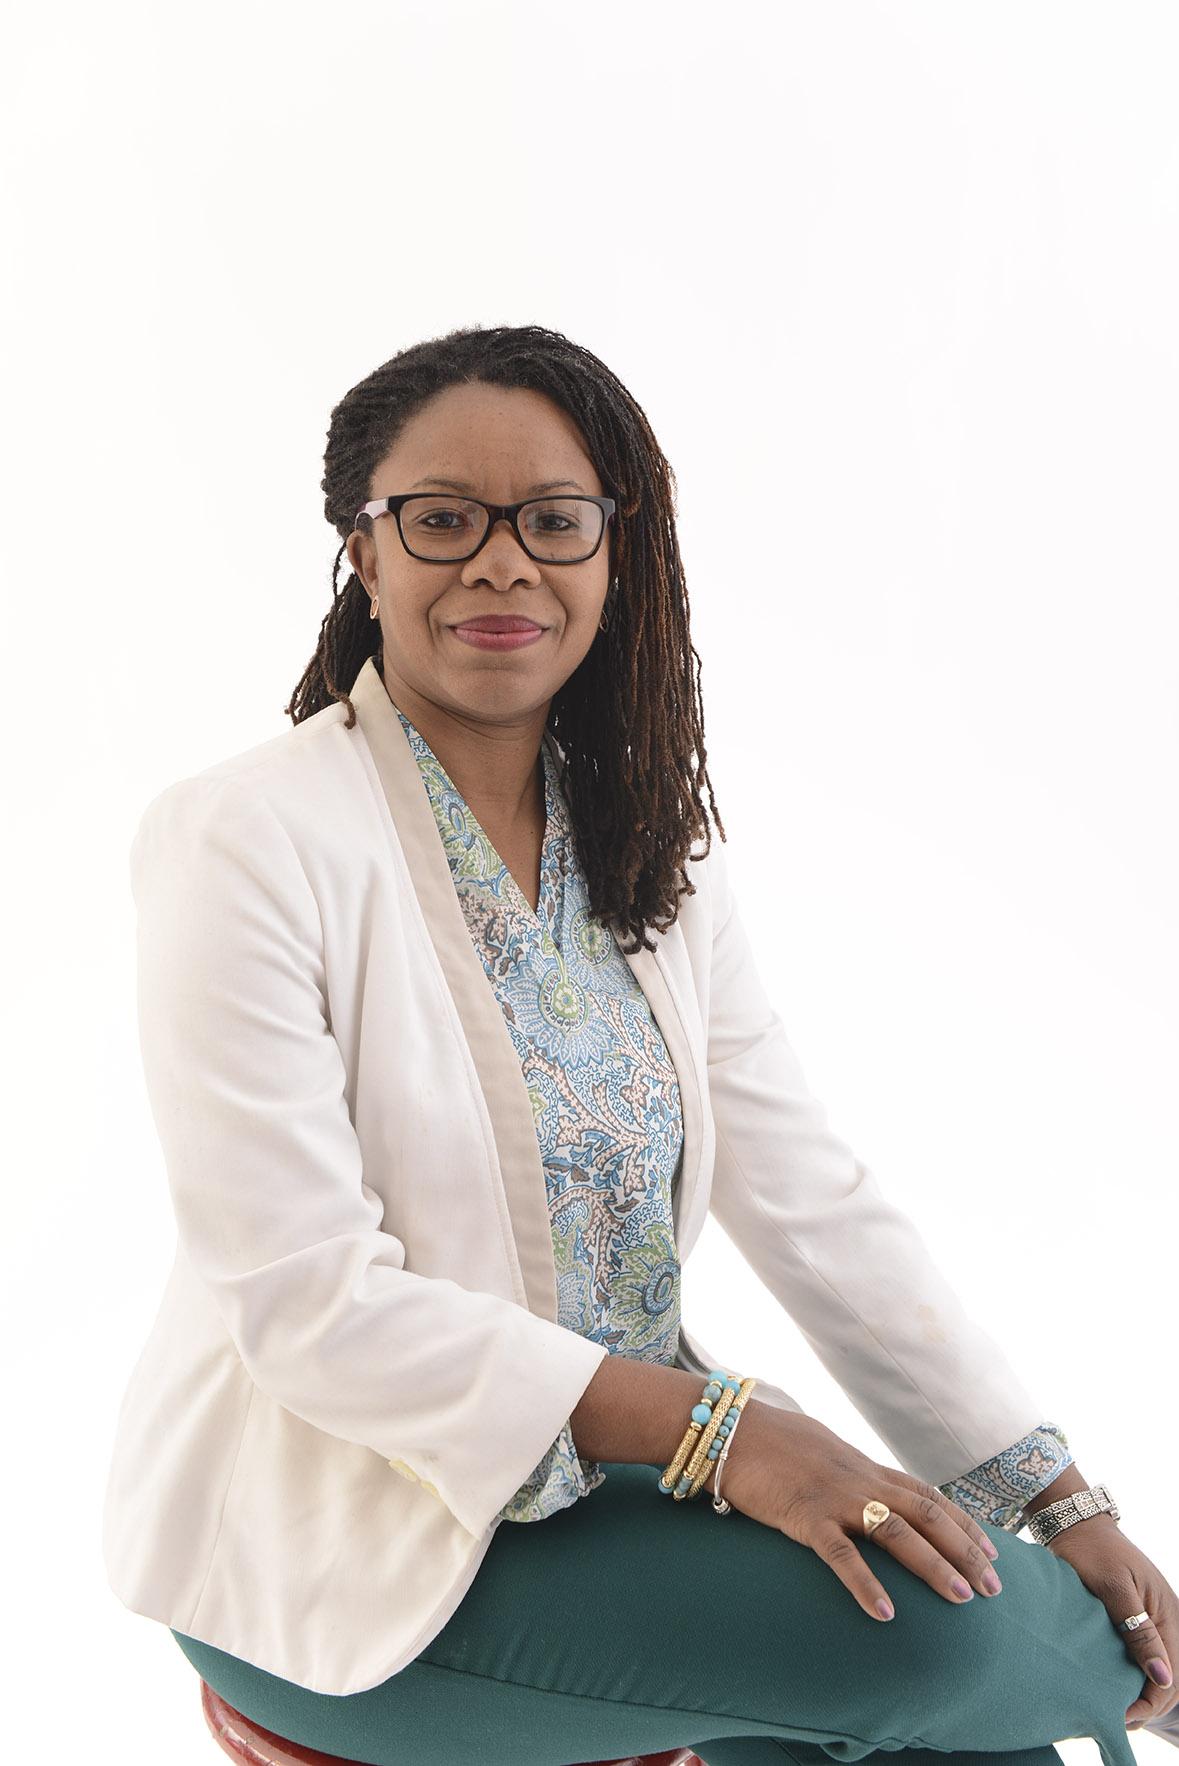 Fabienne Eliacin - Director of Communications